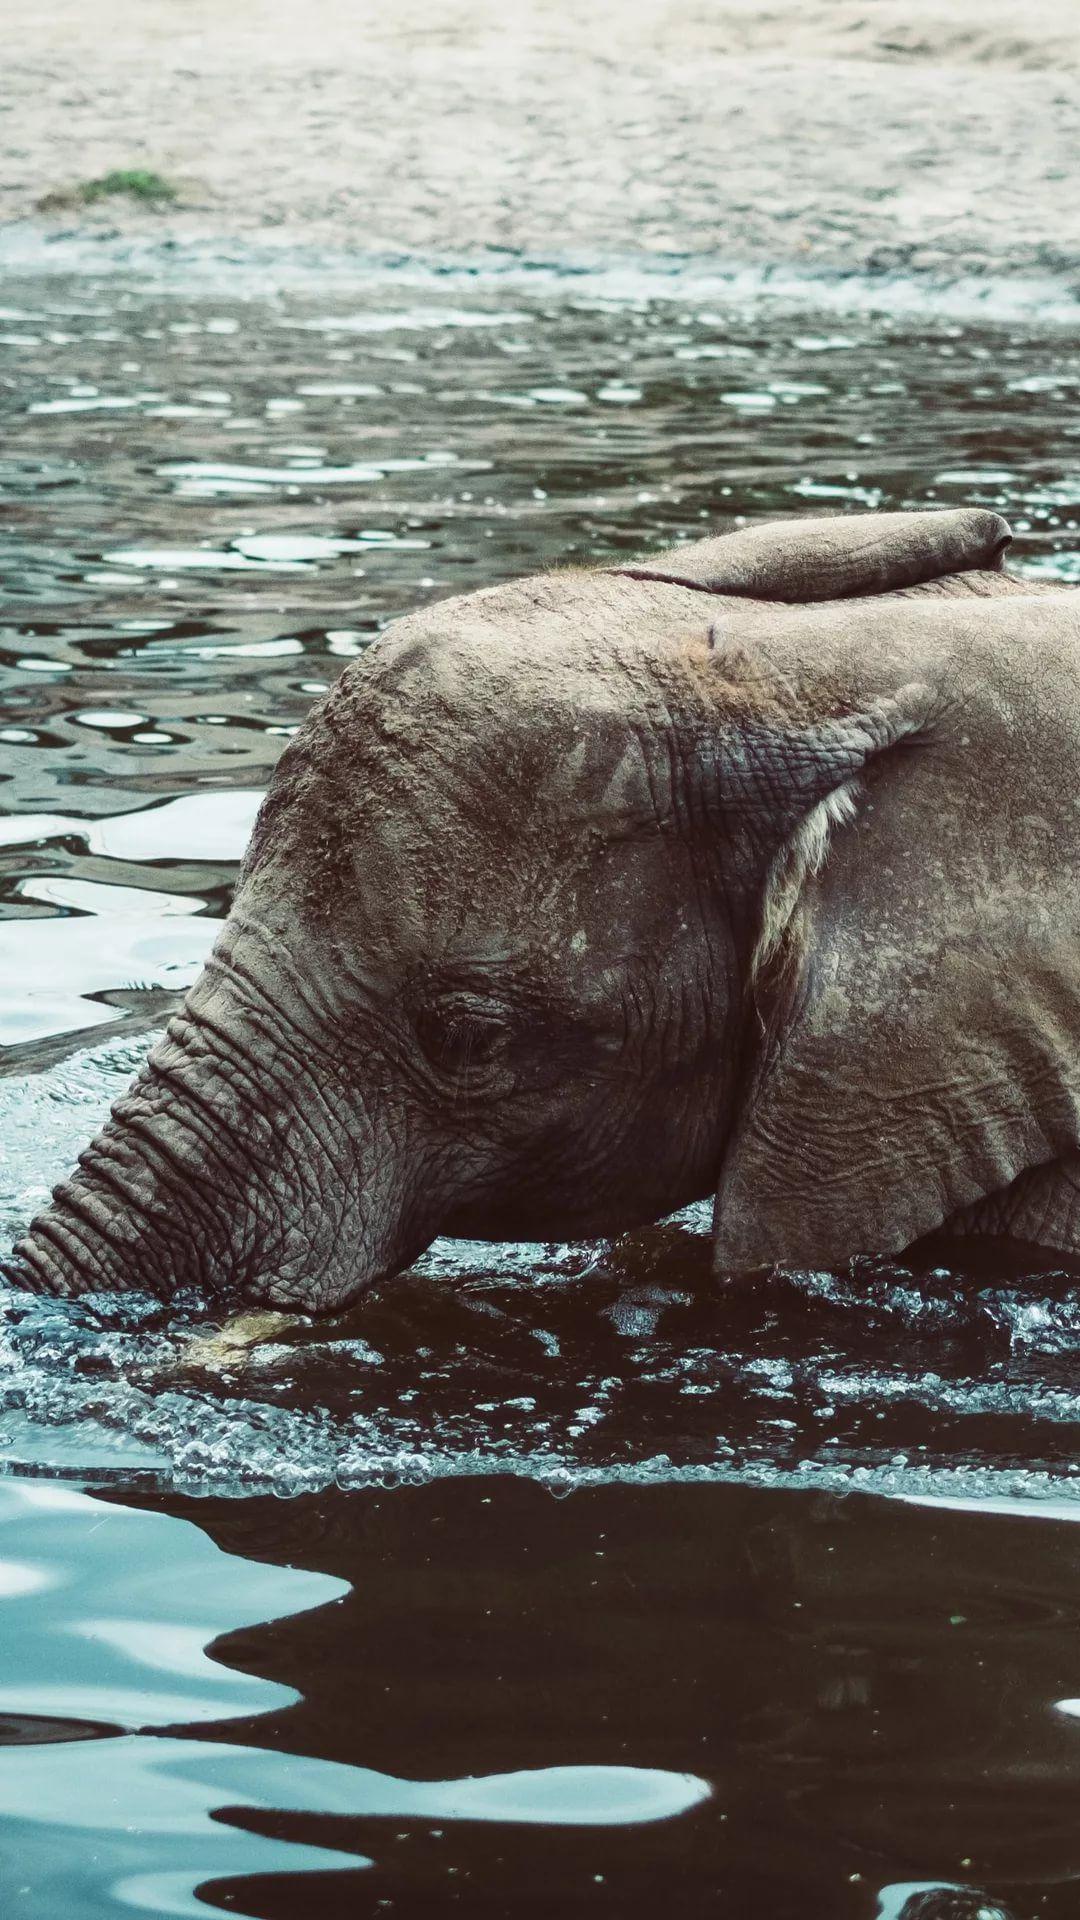 Elephant Tumblr wallpaper